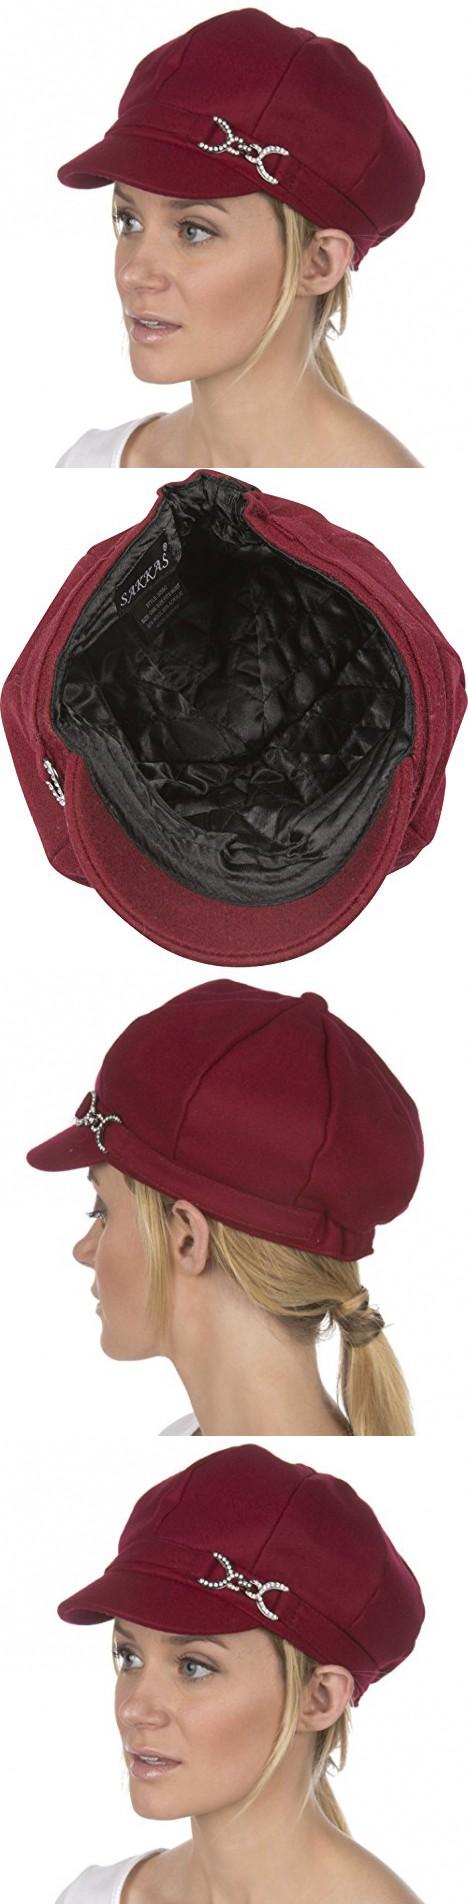 2a56c5b4478bd Sakkas 305BC Jessica Wool Newsboy Cabbie Hat with Rhinestone Buckle -  Burgundy - One Size